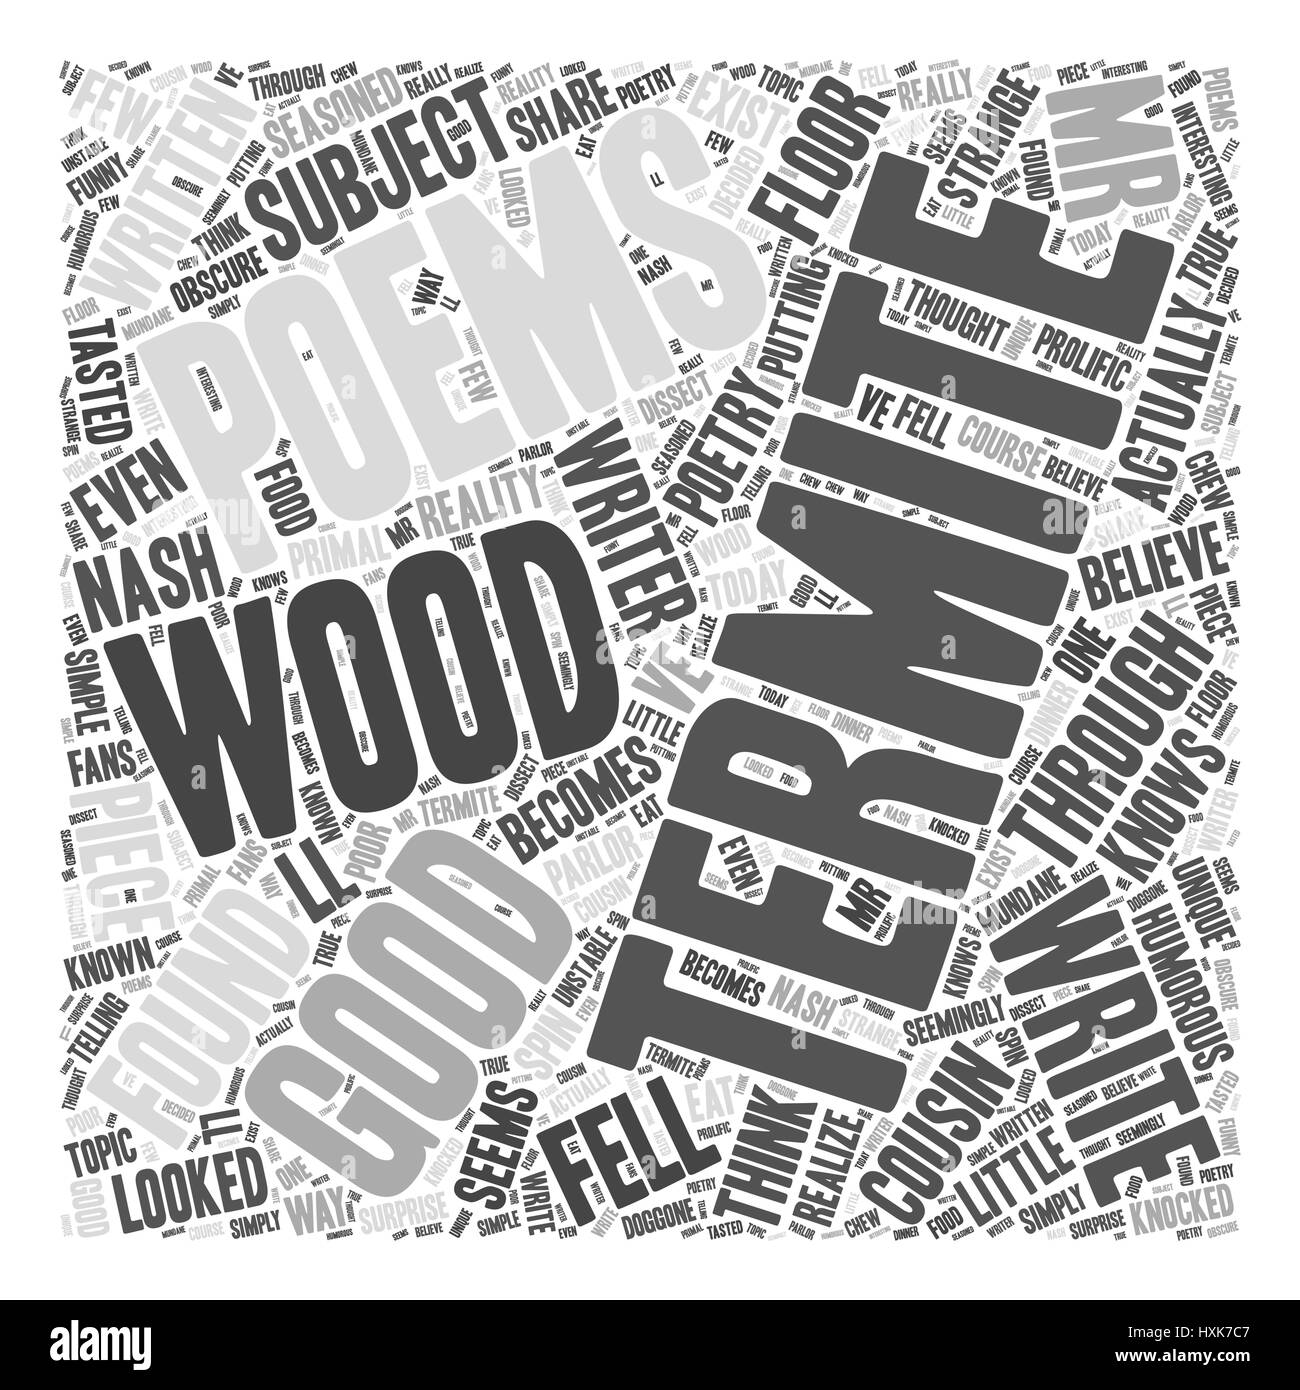 Termite Gedichte Word Cloud-Konzept Stock Vektor